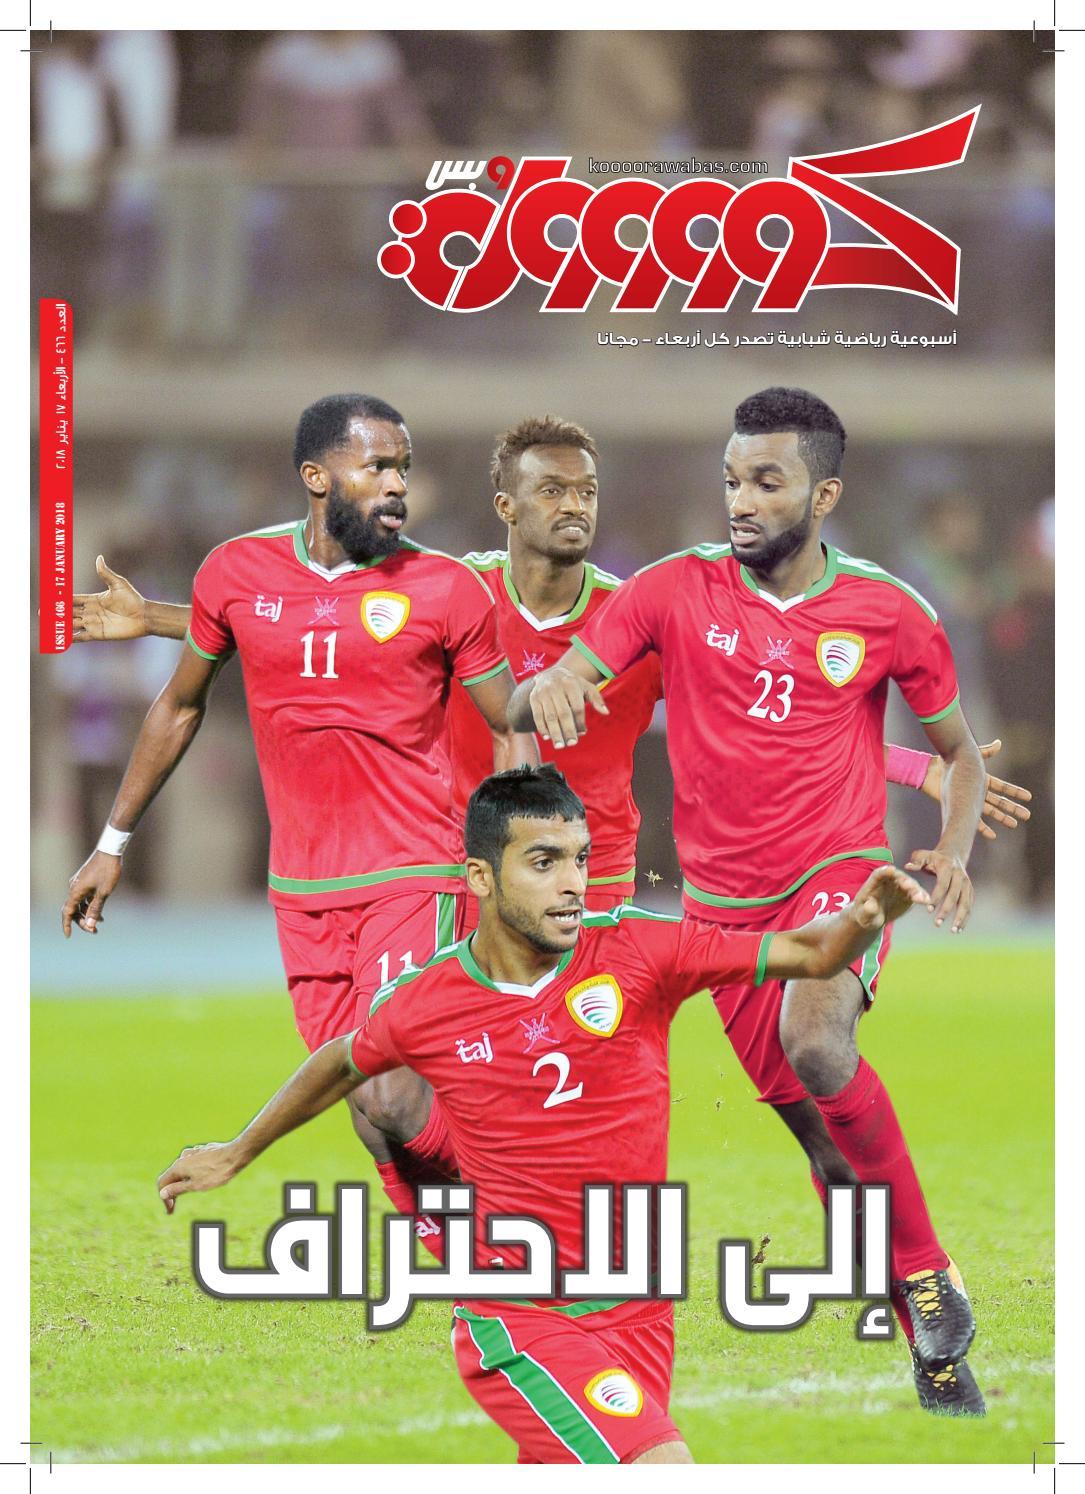 91d17864e Koooora Wa Bas Issue #466 17 January 2018 by Koooora Wa Bas - issuu